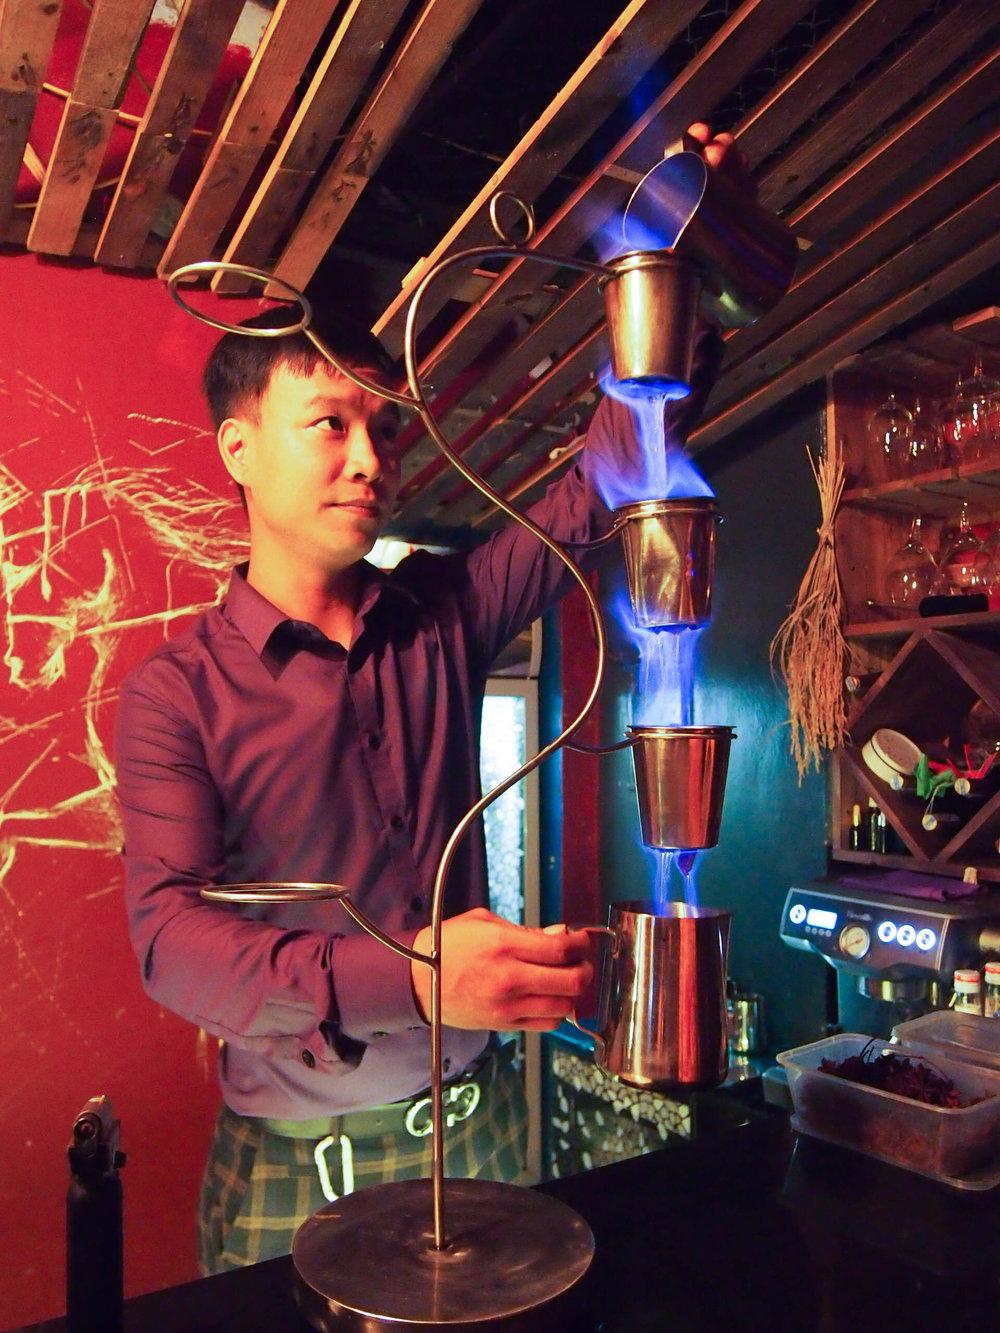 Pho Cocktail in Hanoi